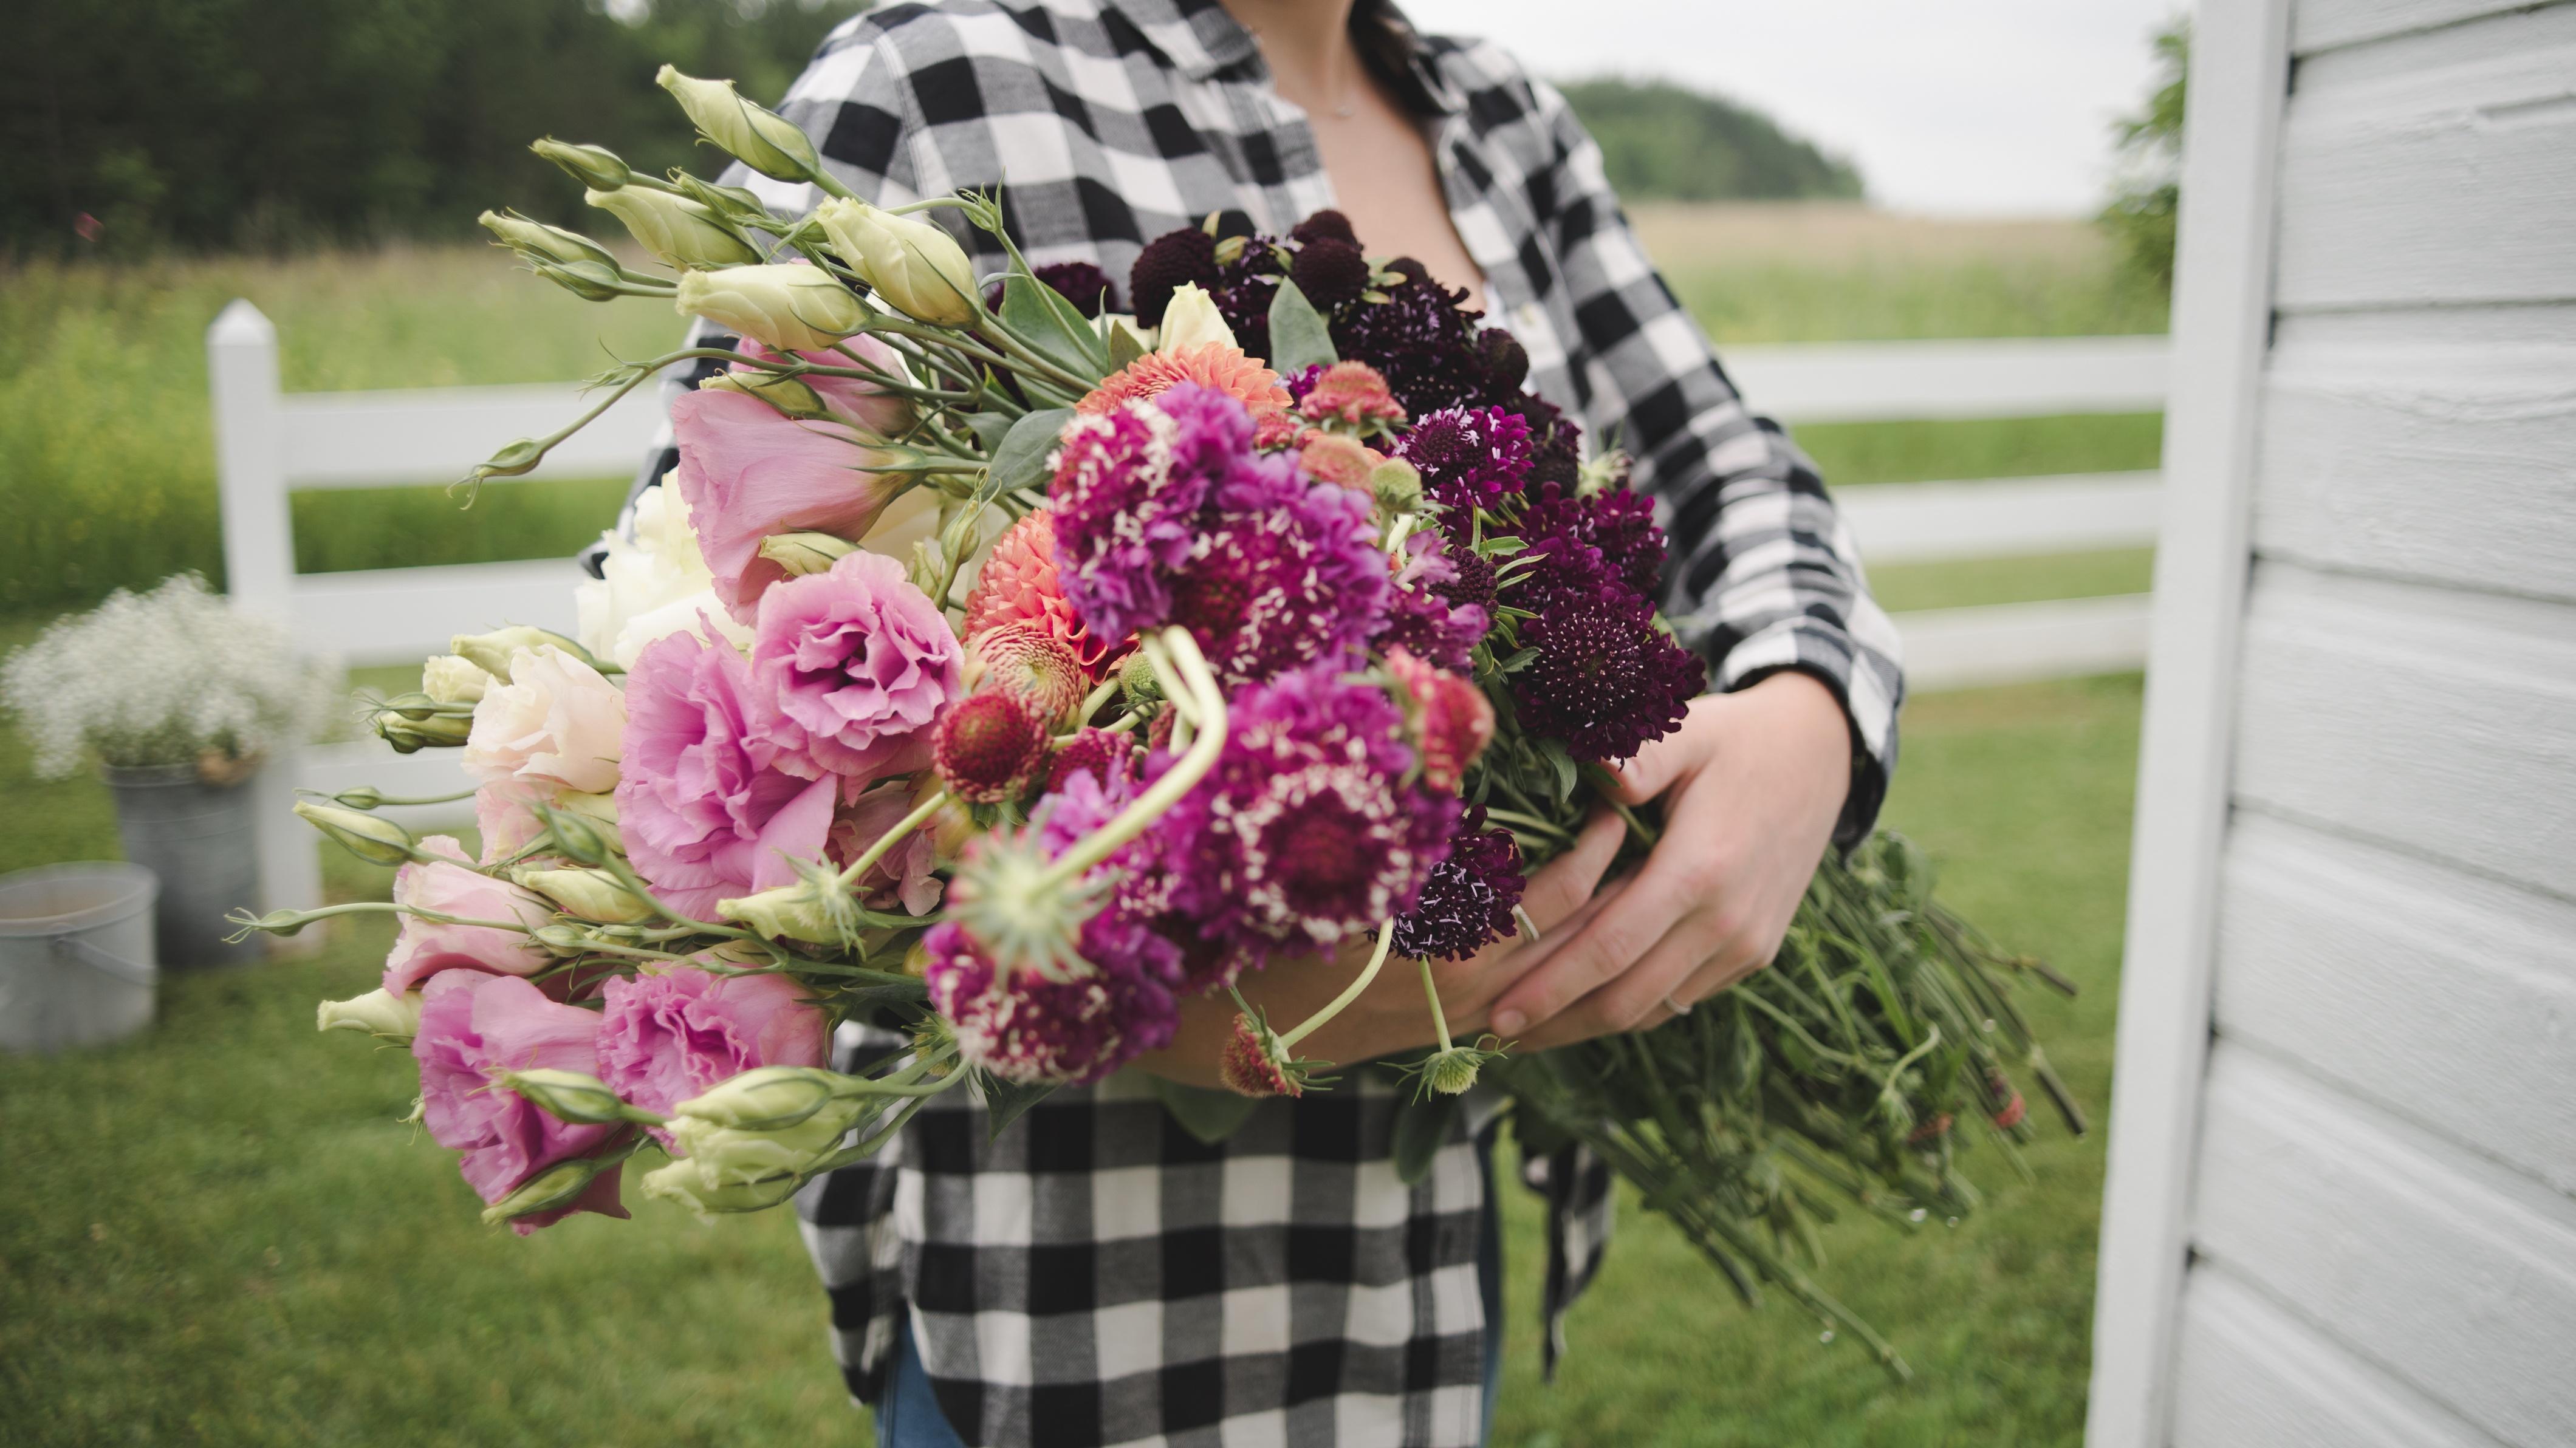 FlowerFarm fresh